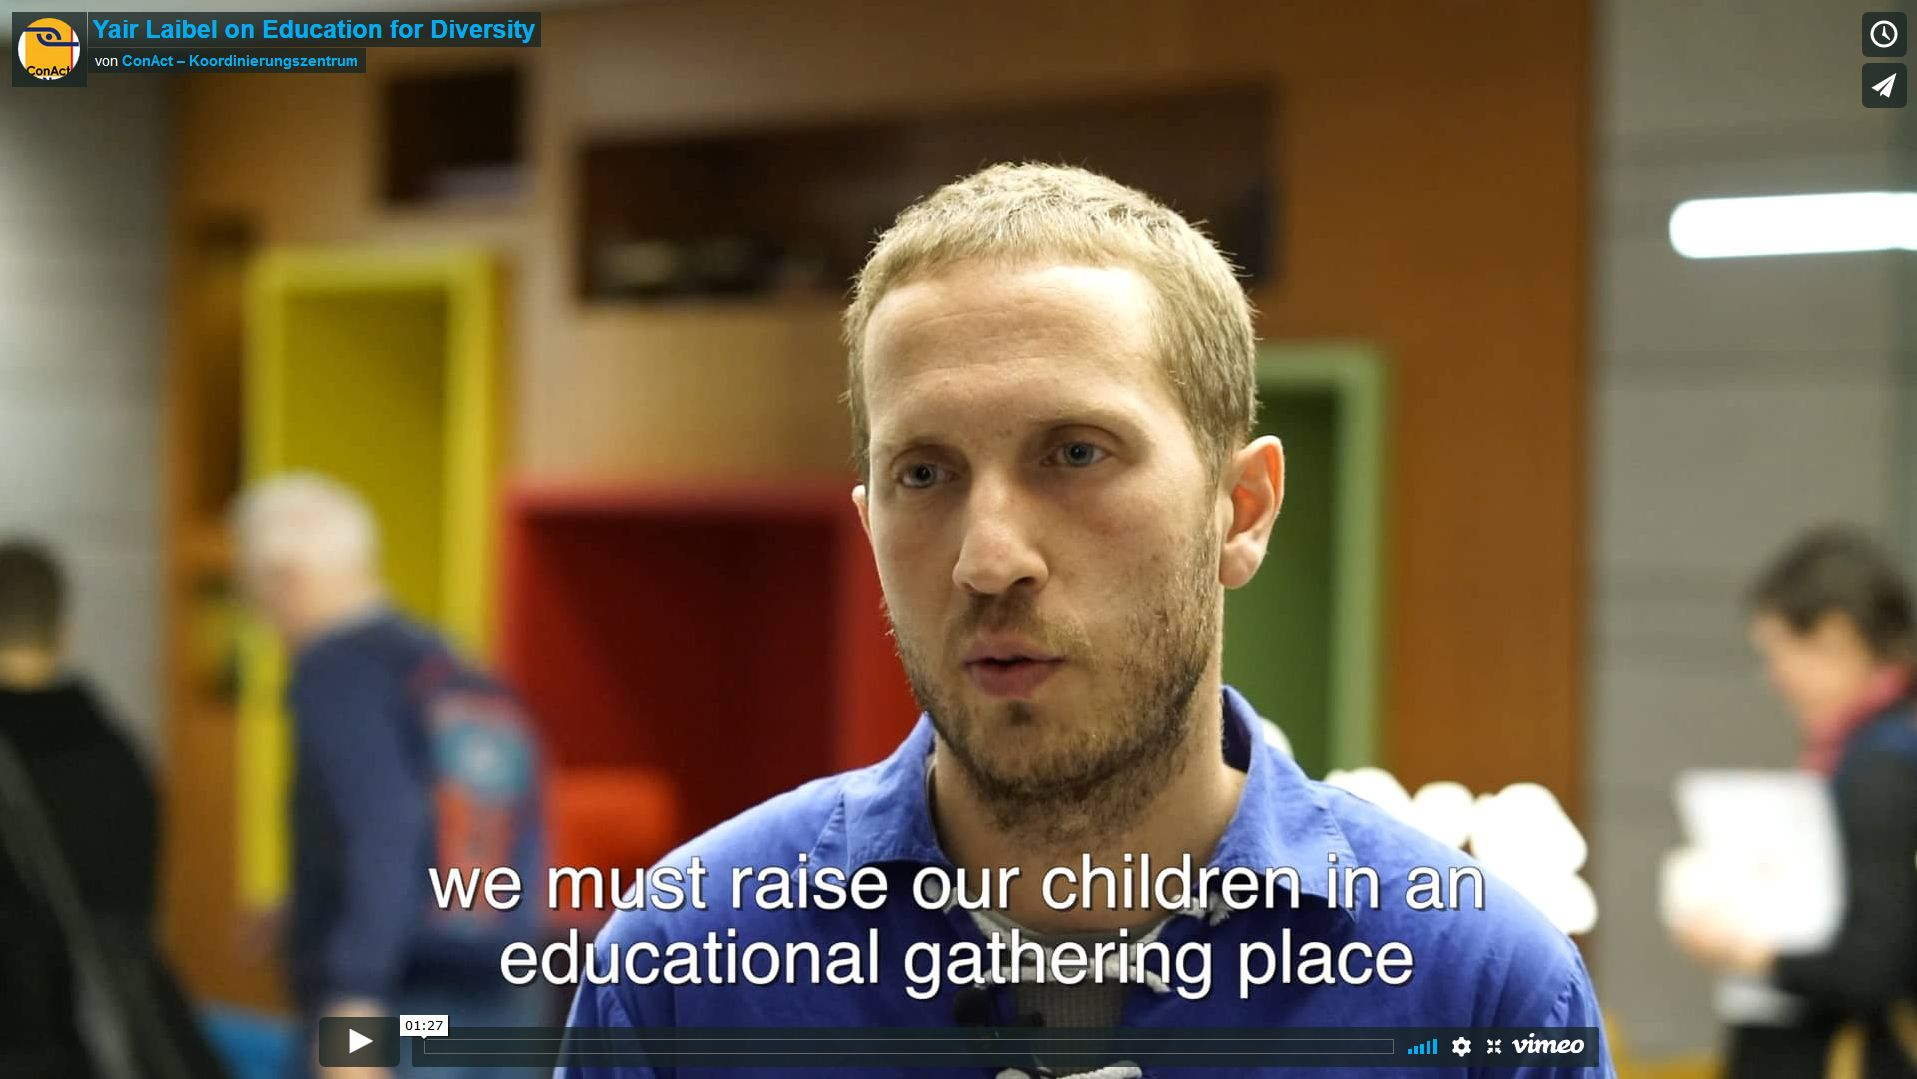 Yair Laibel on Education for Diversity